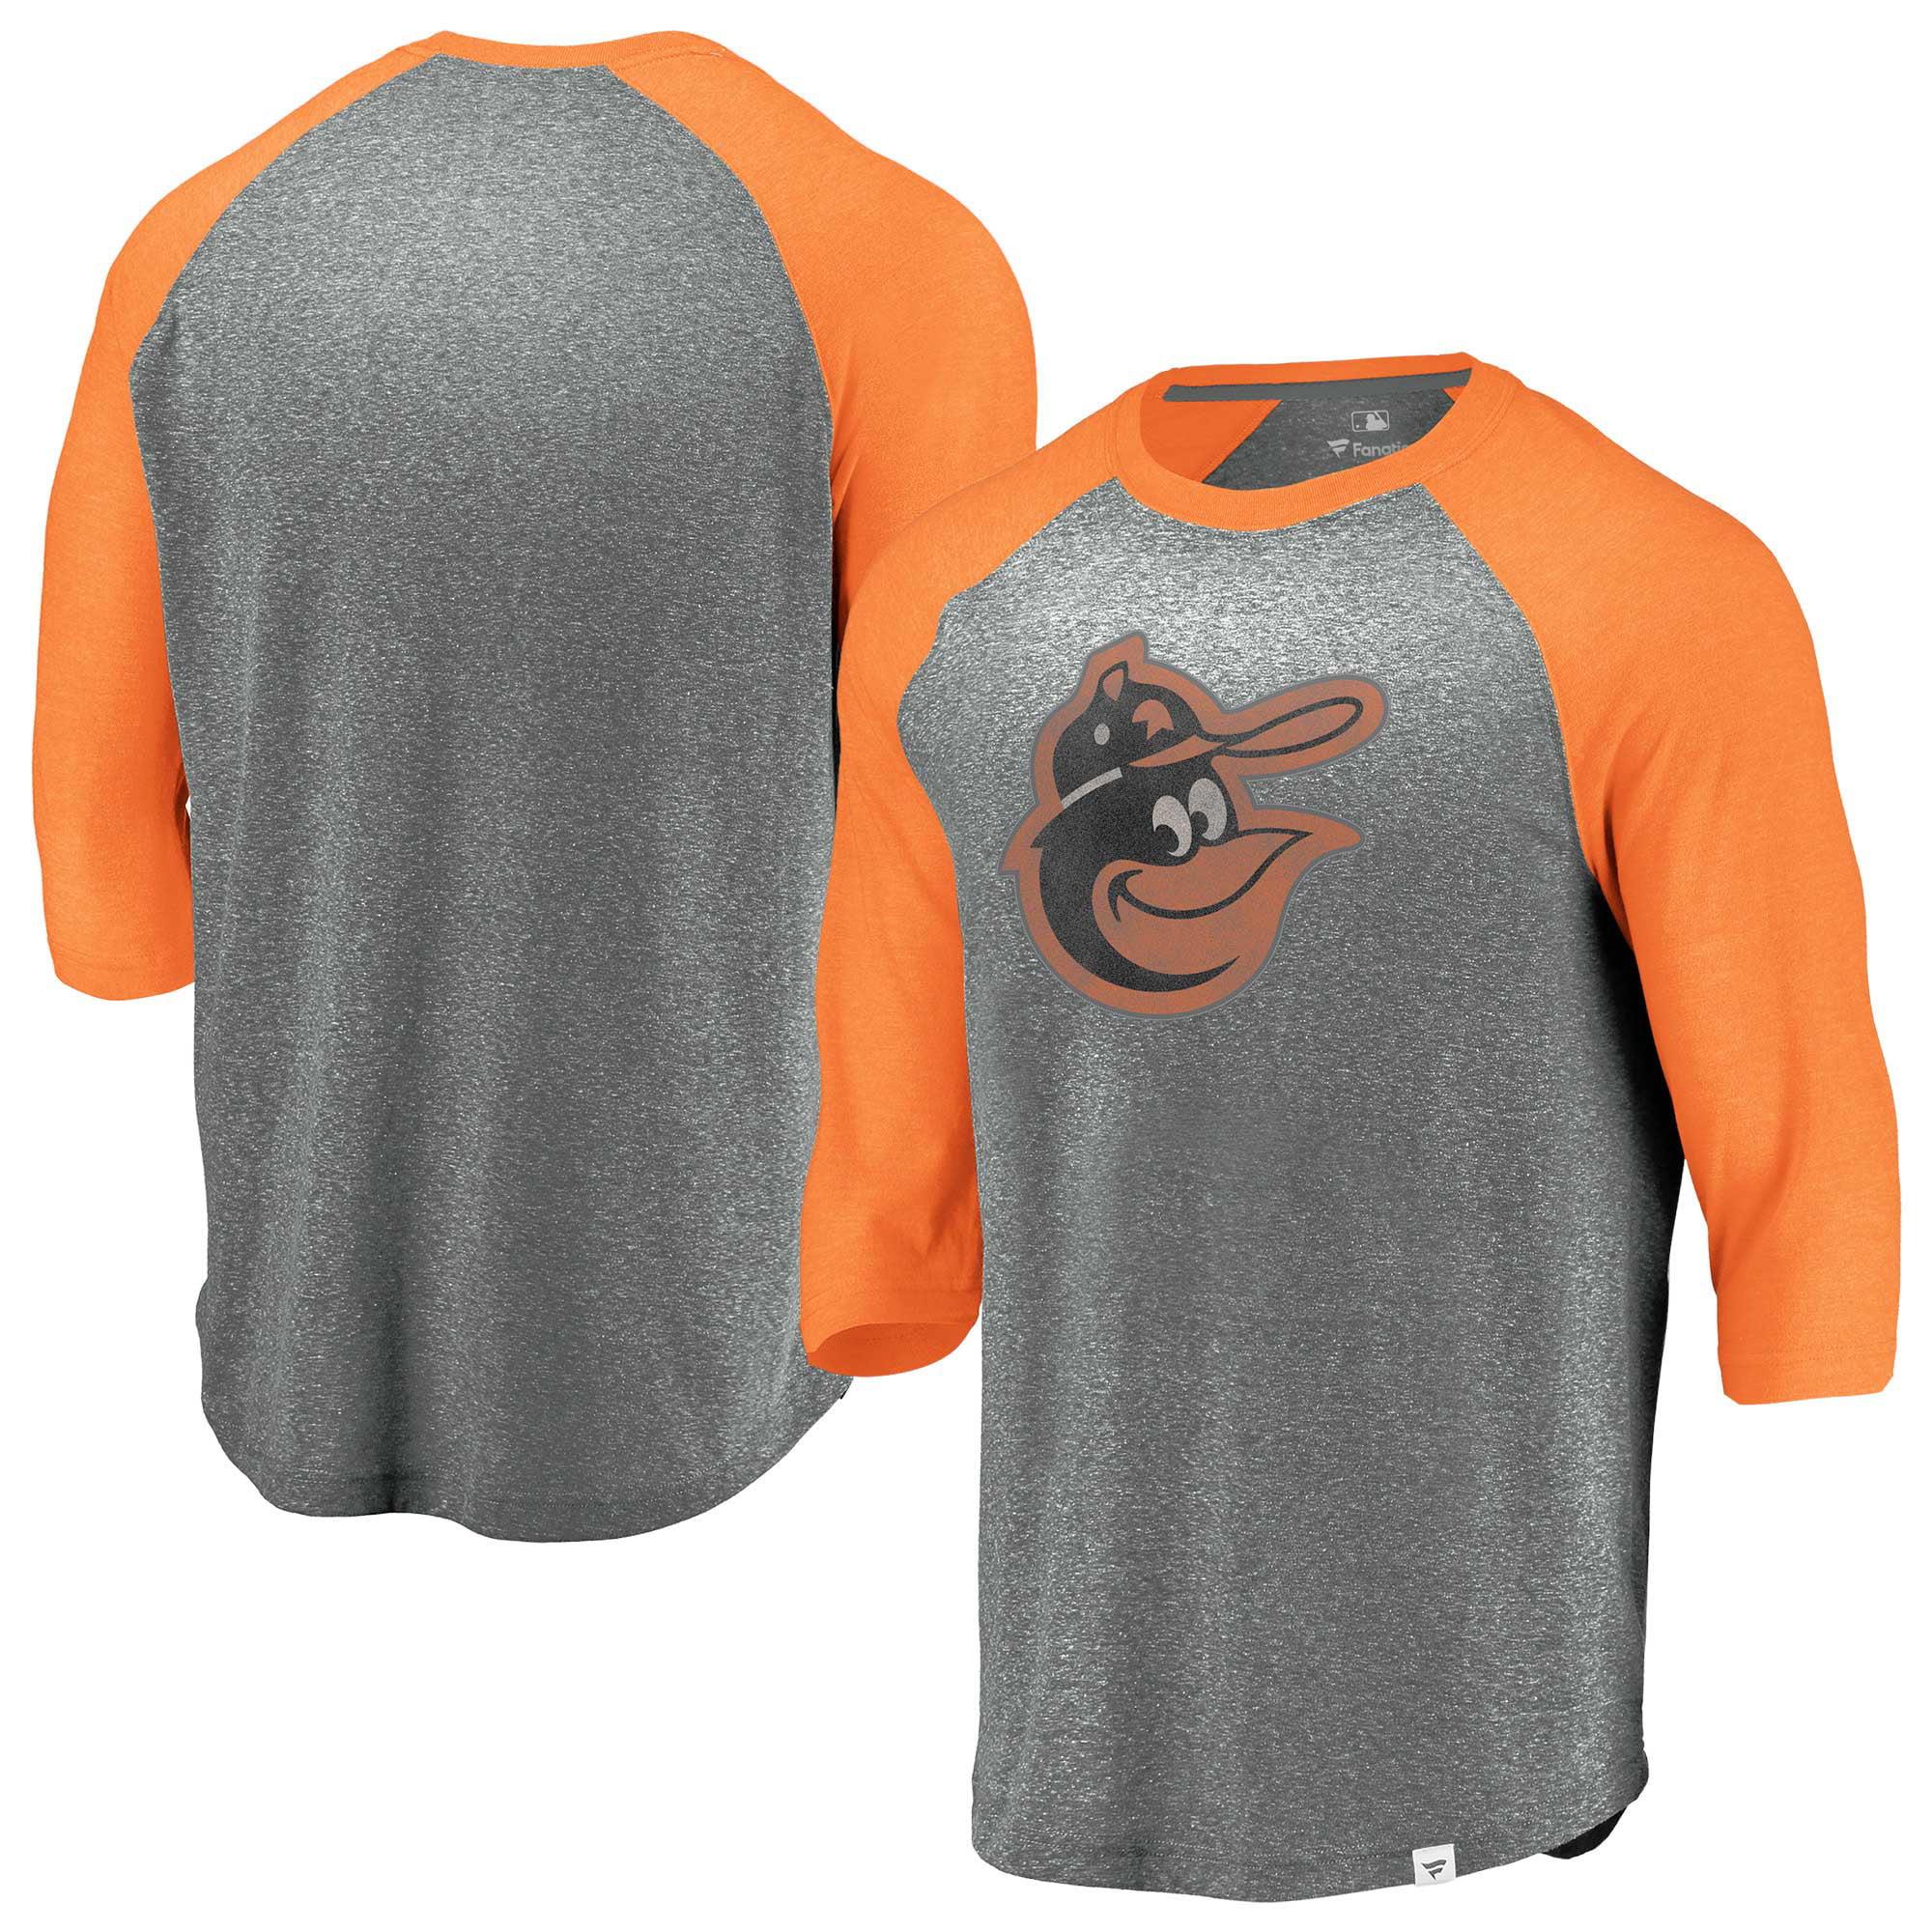 Baltimore Orioles Fanatics Branded Cooperstown Collection Massive Devotees Tri-Blend Raglan 3/4-Sleeve T-Shirt - Heathered Gray/Orange